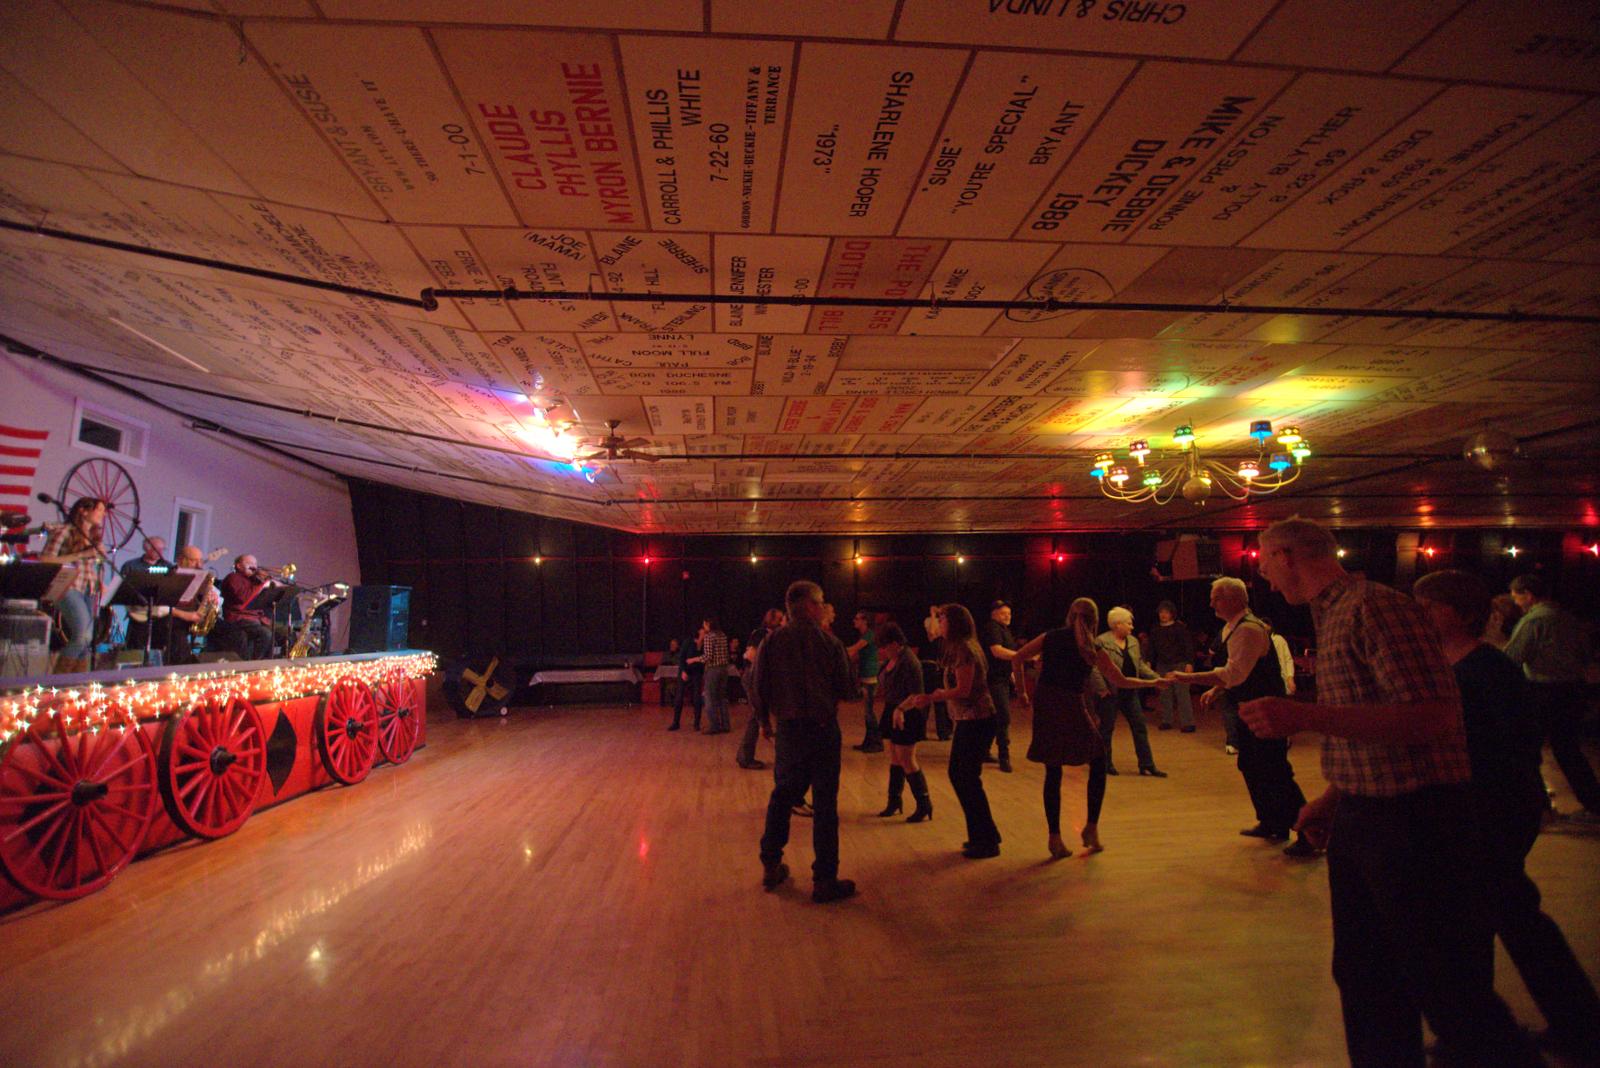 Dancing to Jump City Social Club